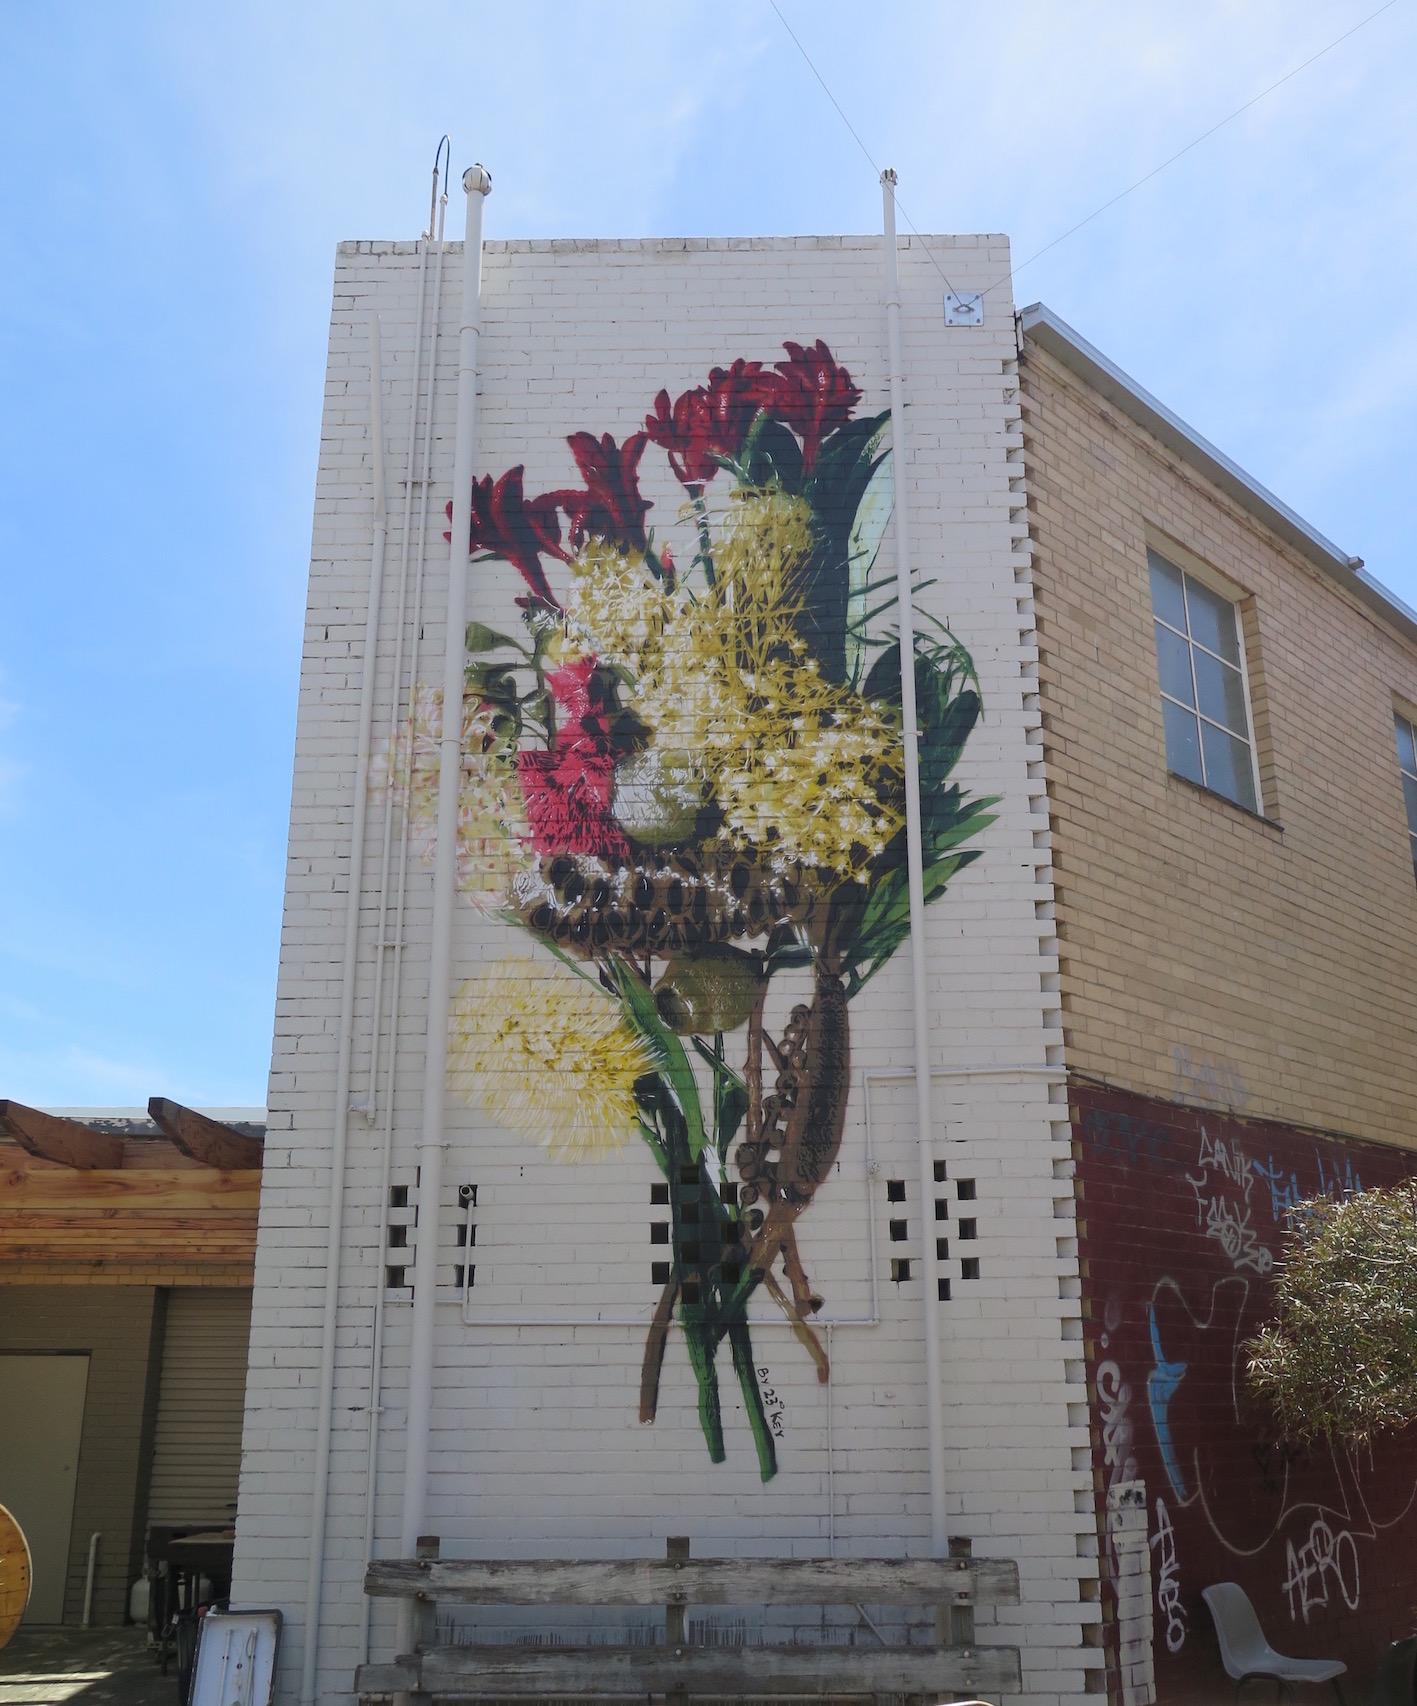 deansunshine_landofsunshine_melbourne_streetart_graffiti_eastland urban art project 2 23rd key 2